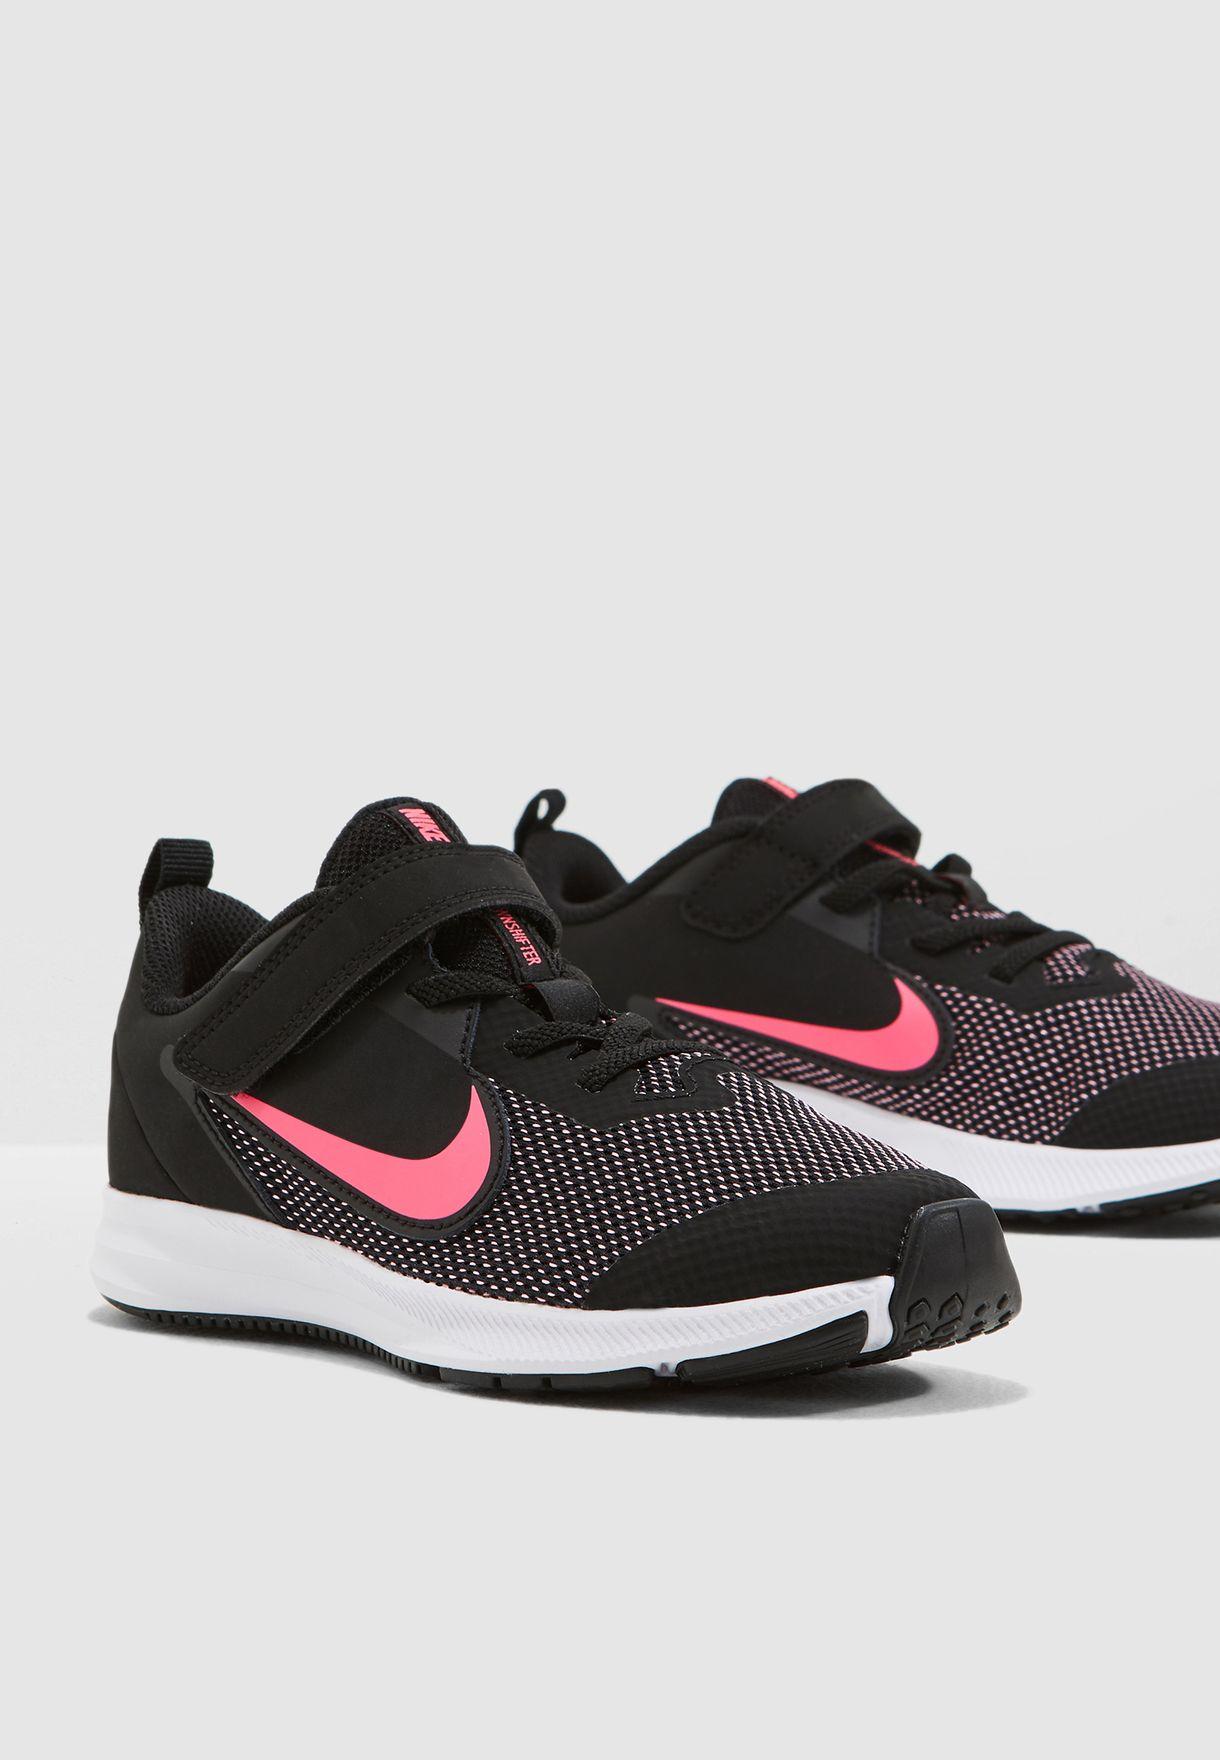 ab83edc8bed1 Shop Nike black Kids Downshifter 9 AR4138-003 for Kids in UAE ...